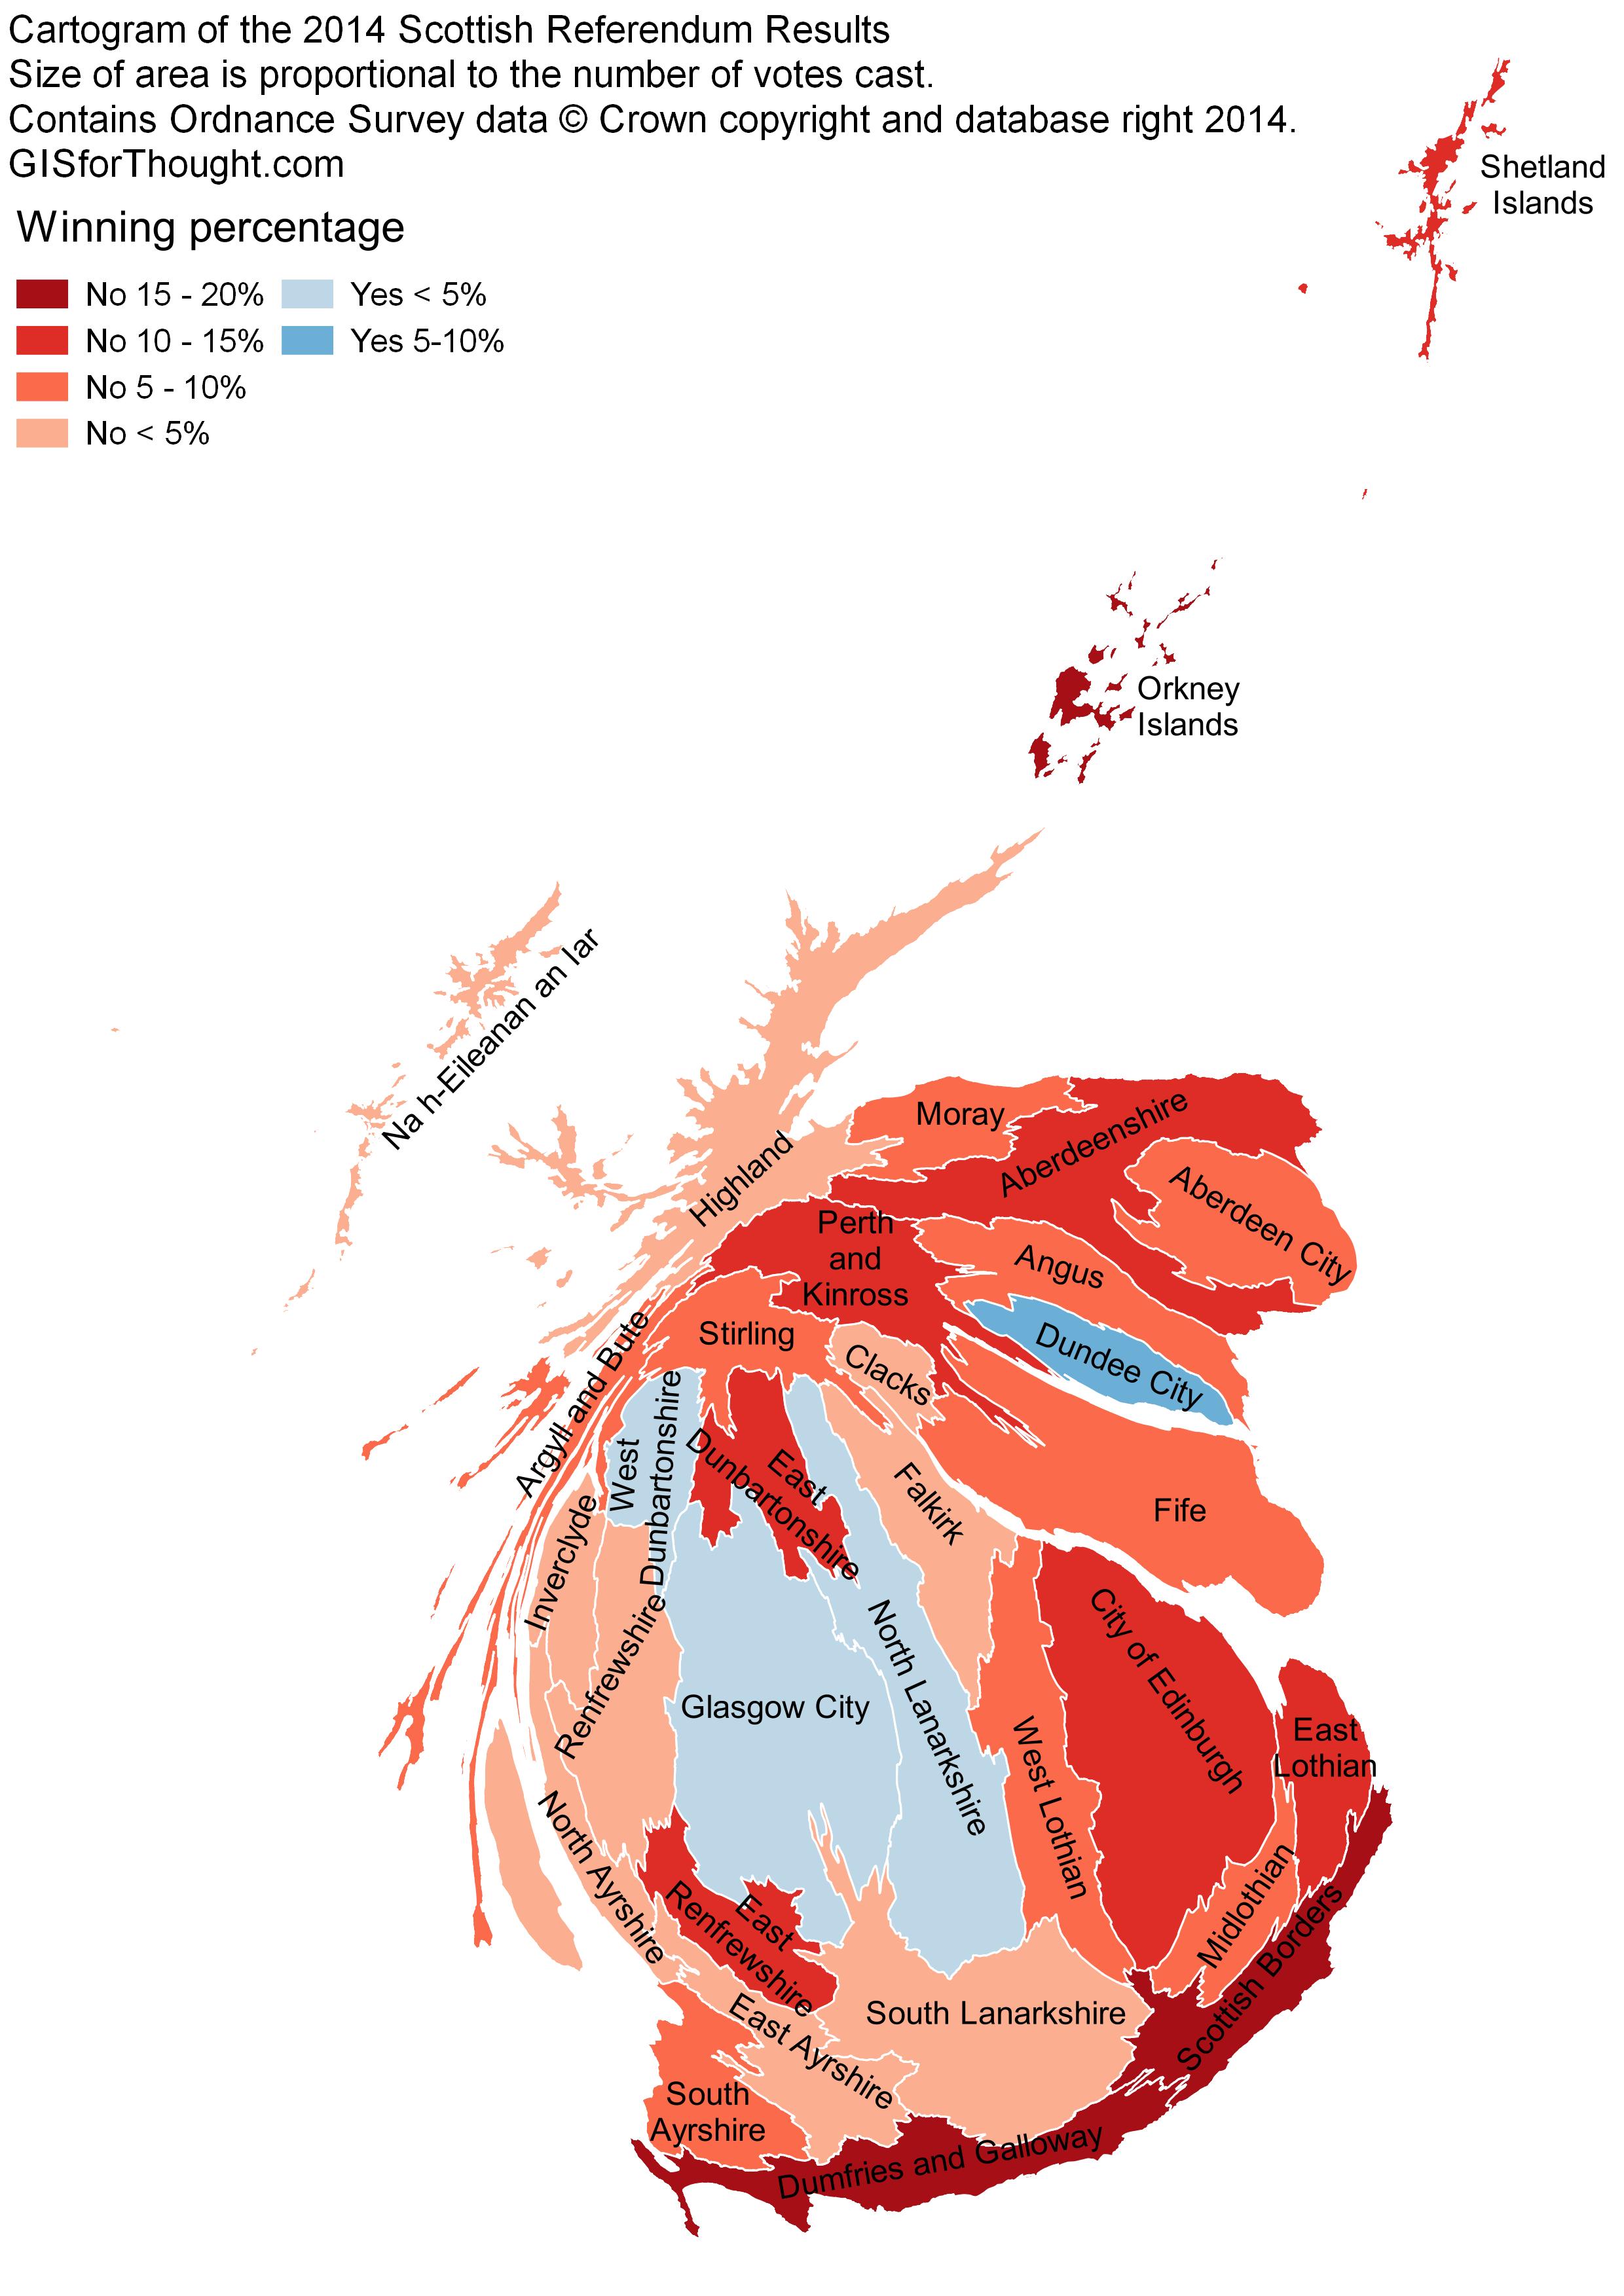 Scottish Independence Referendum 2014 - Cartogram